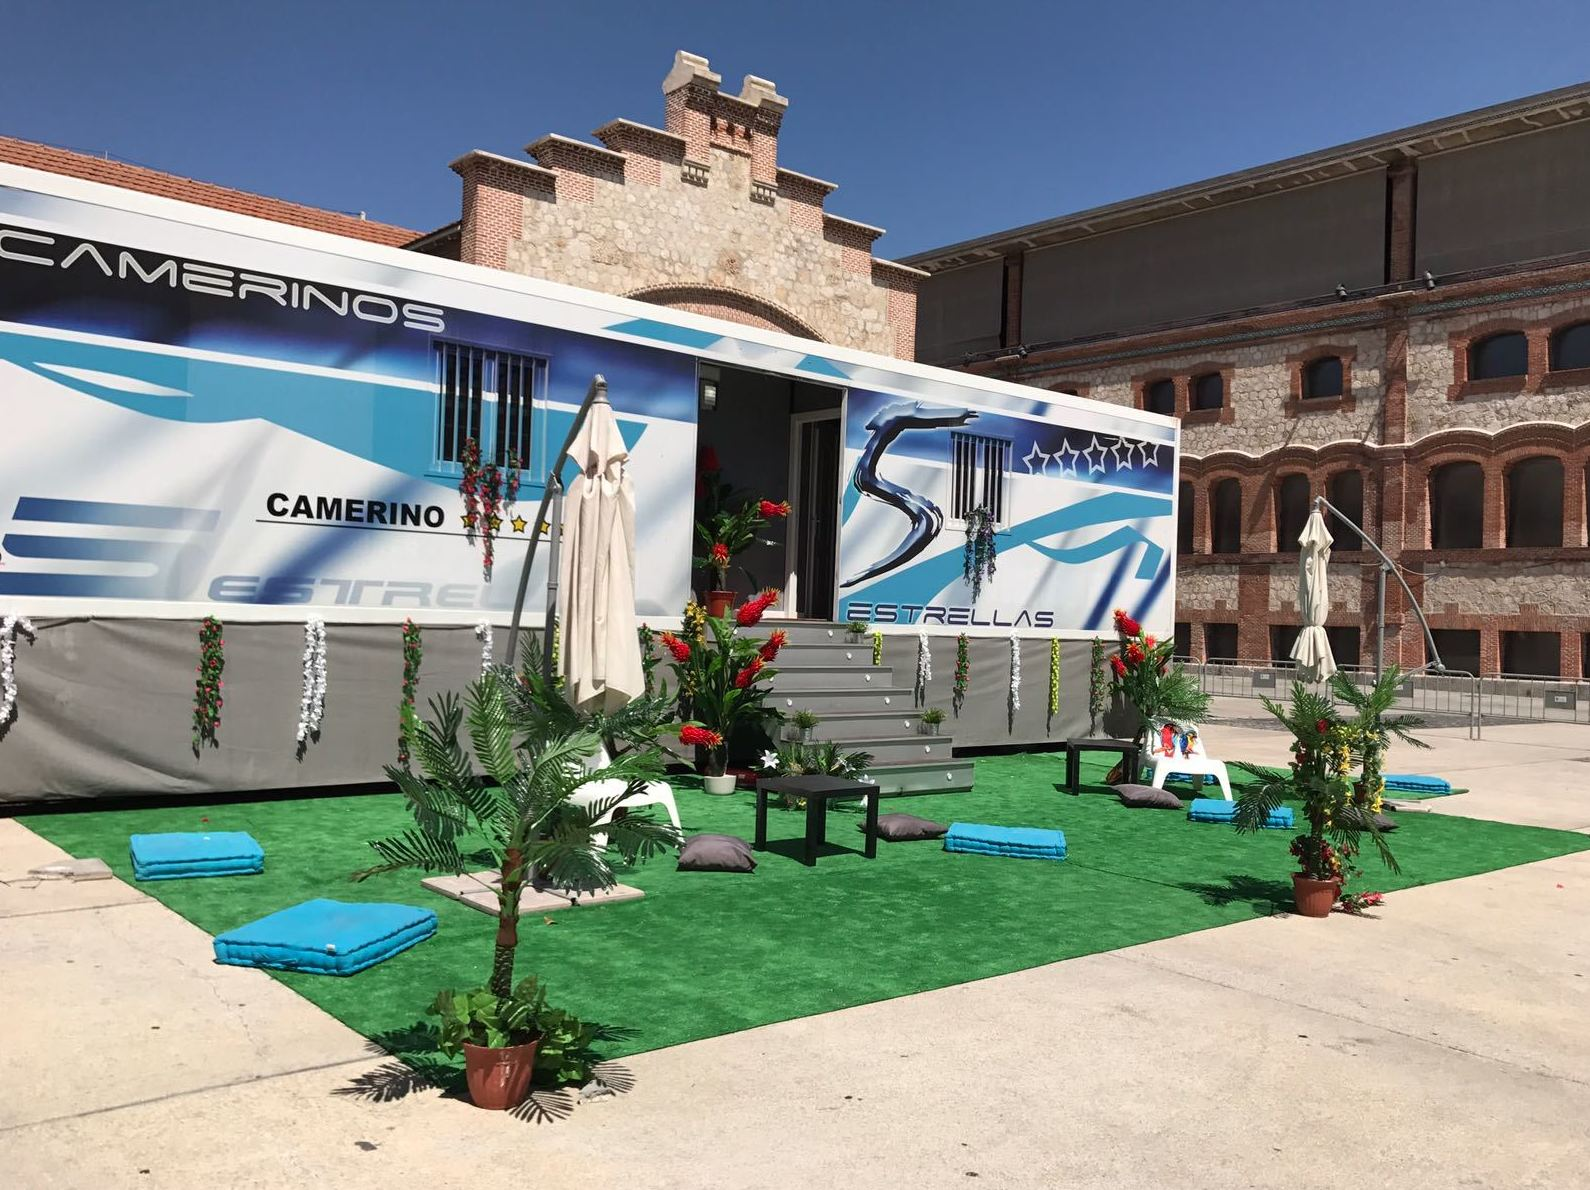 Alquiler de camerino 5 estrellas para eventos - Froilán grupos electrógenos en León